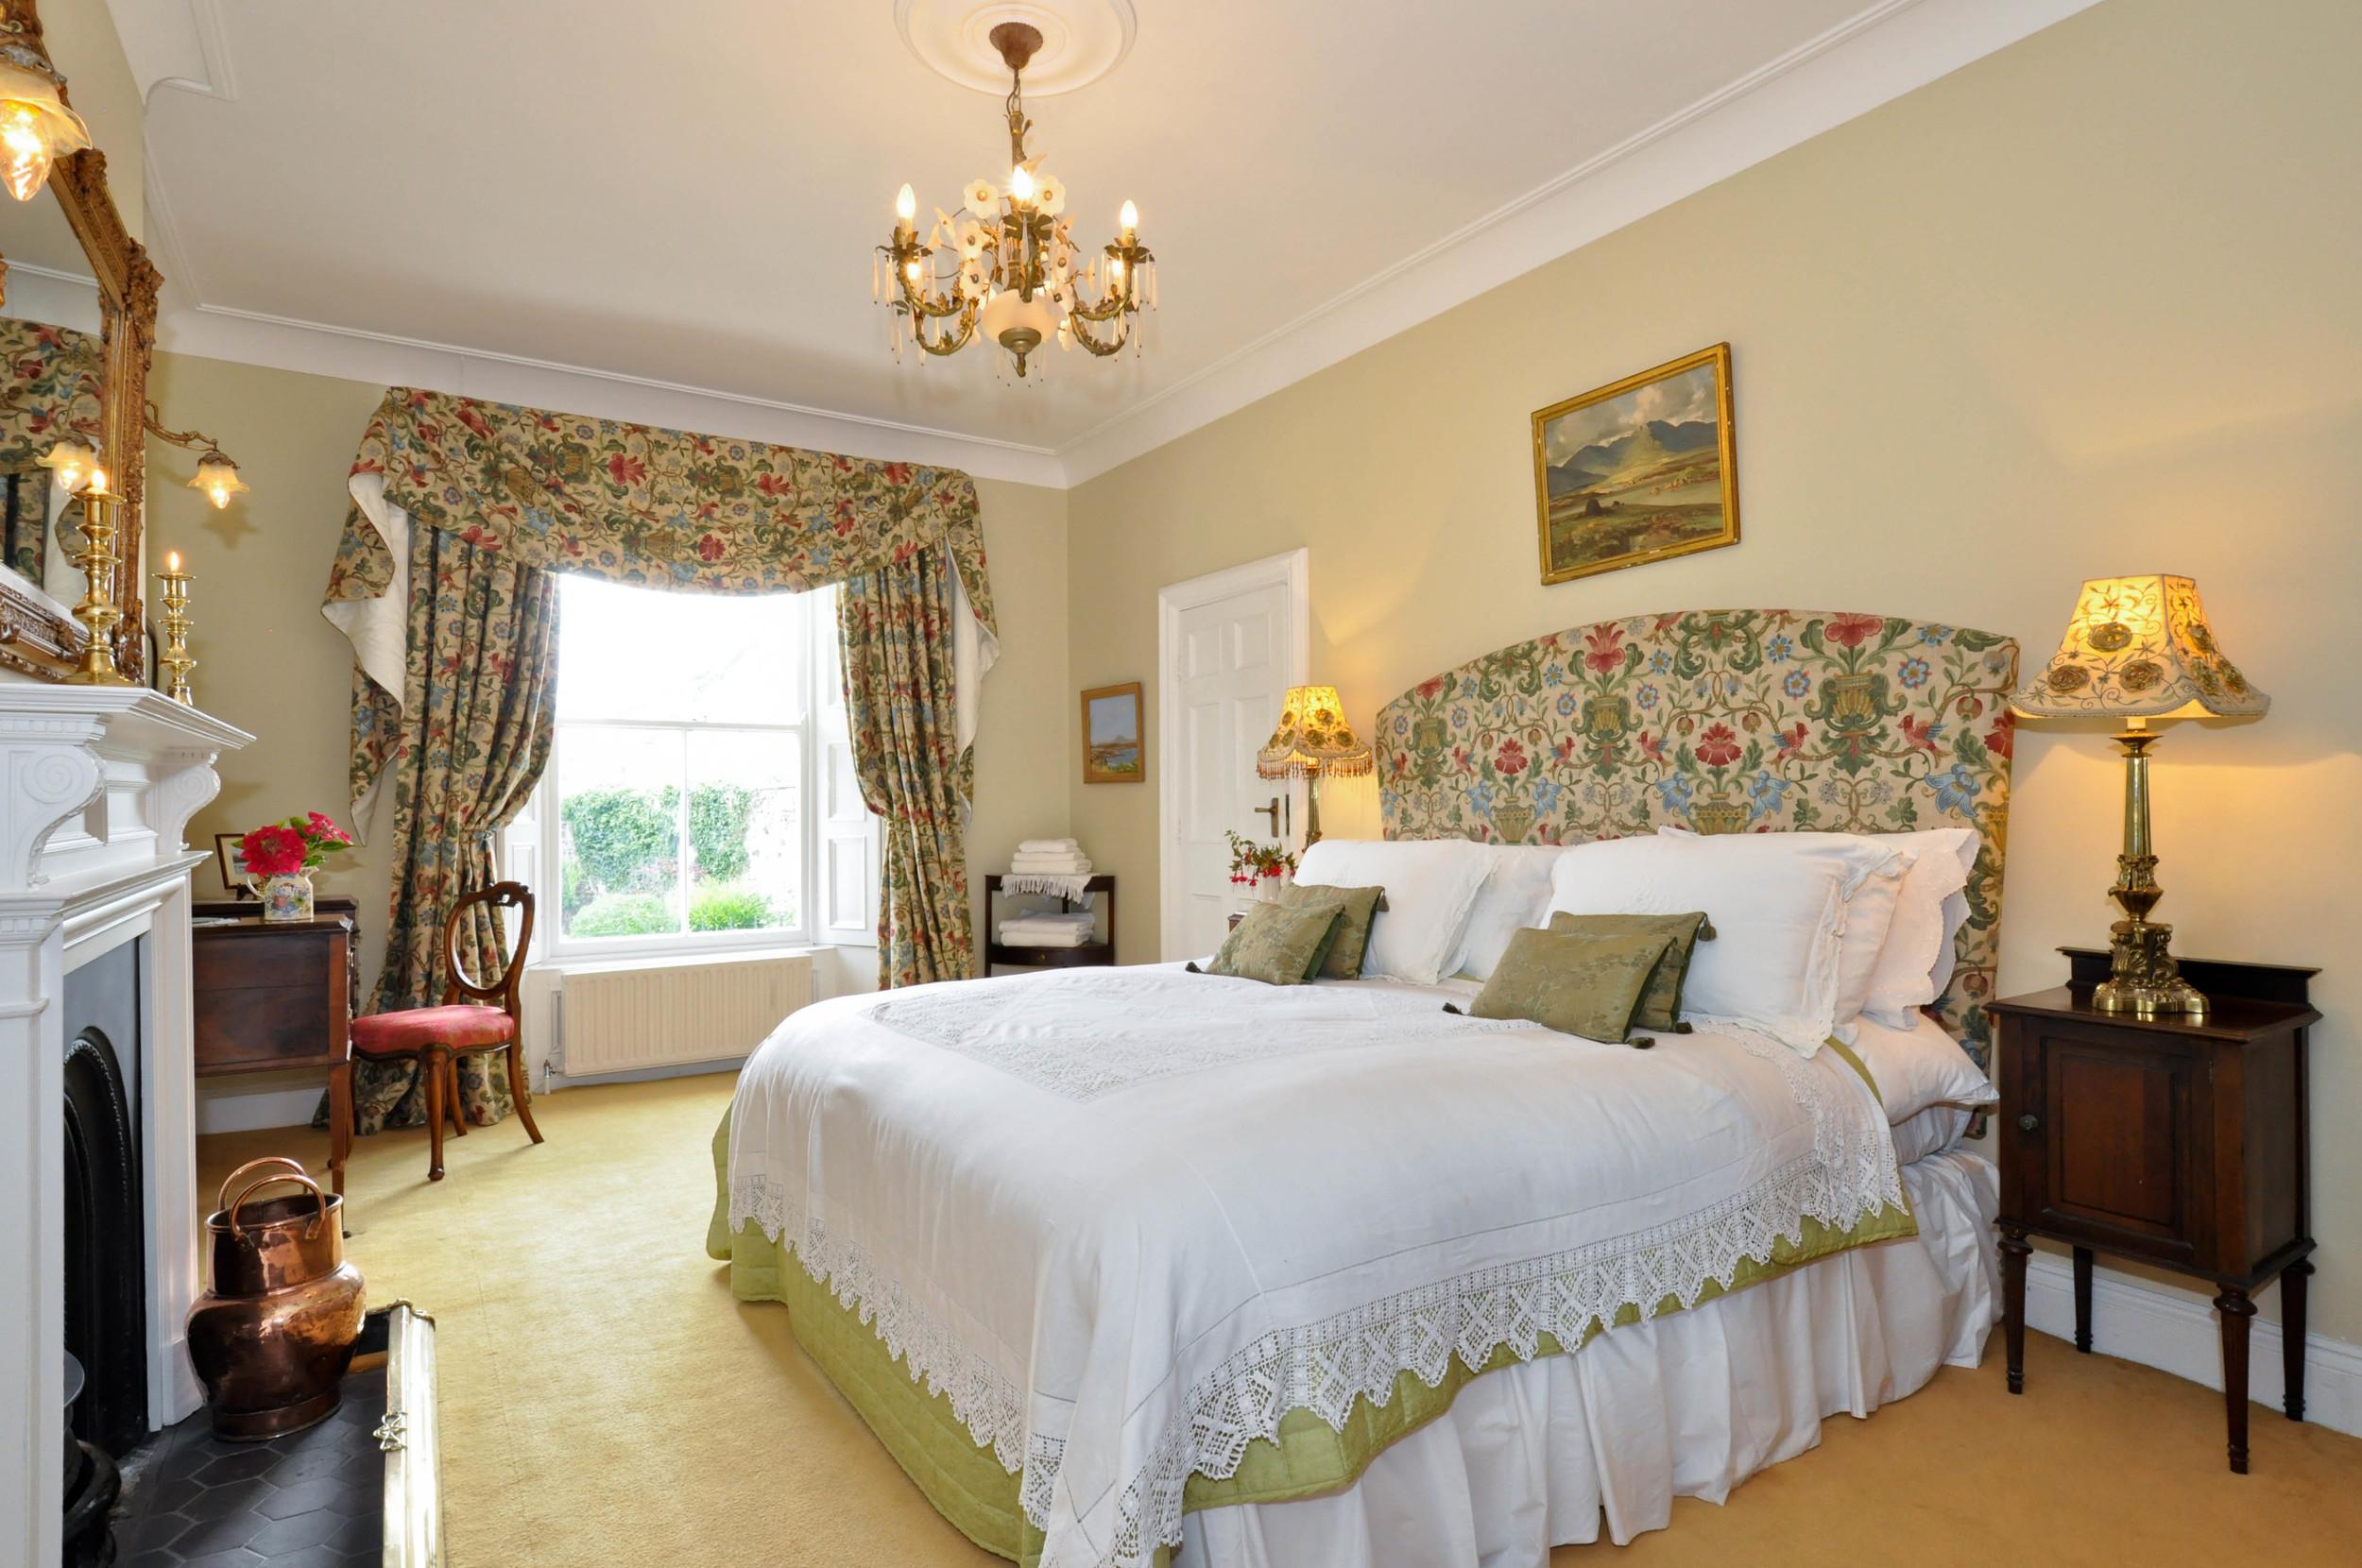 Luxury Accommodation Galway Ireland